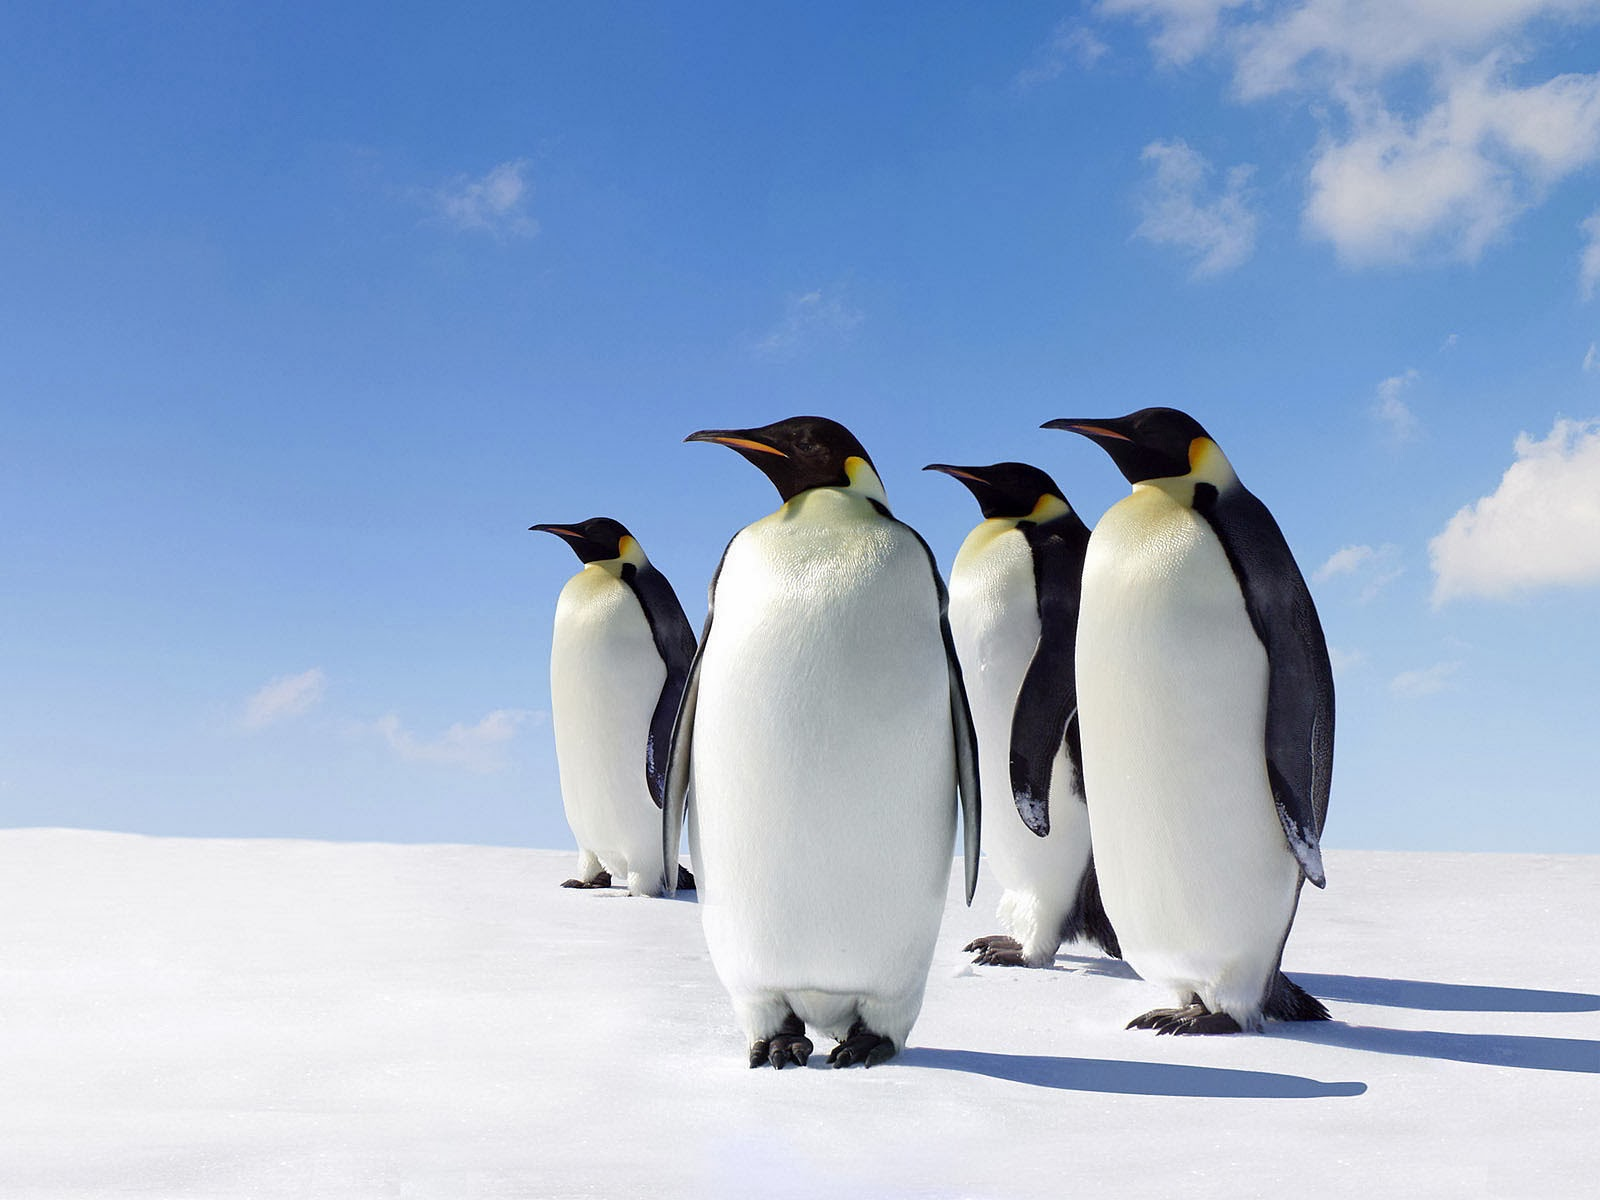 Clovisso Wallpaper Gallery King Penguins Wallpapers 1600x1200